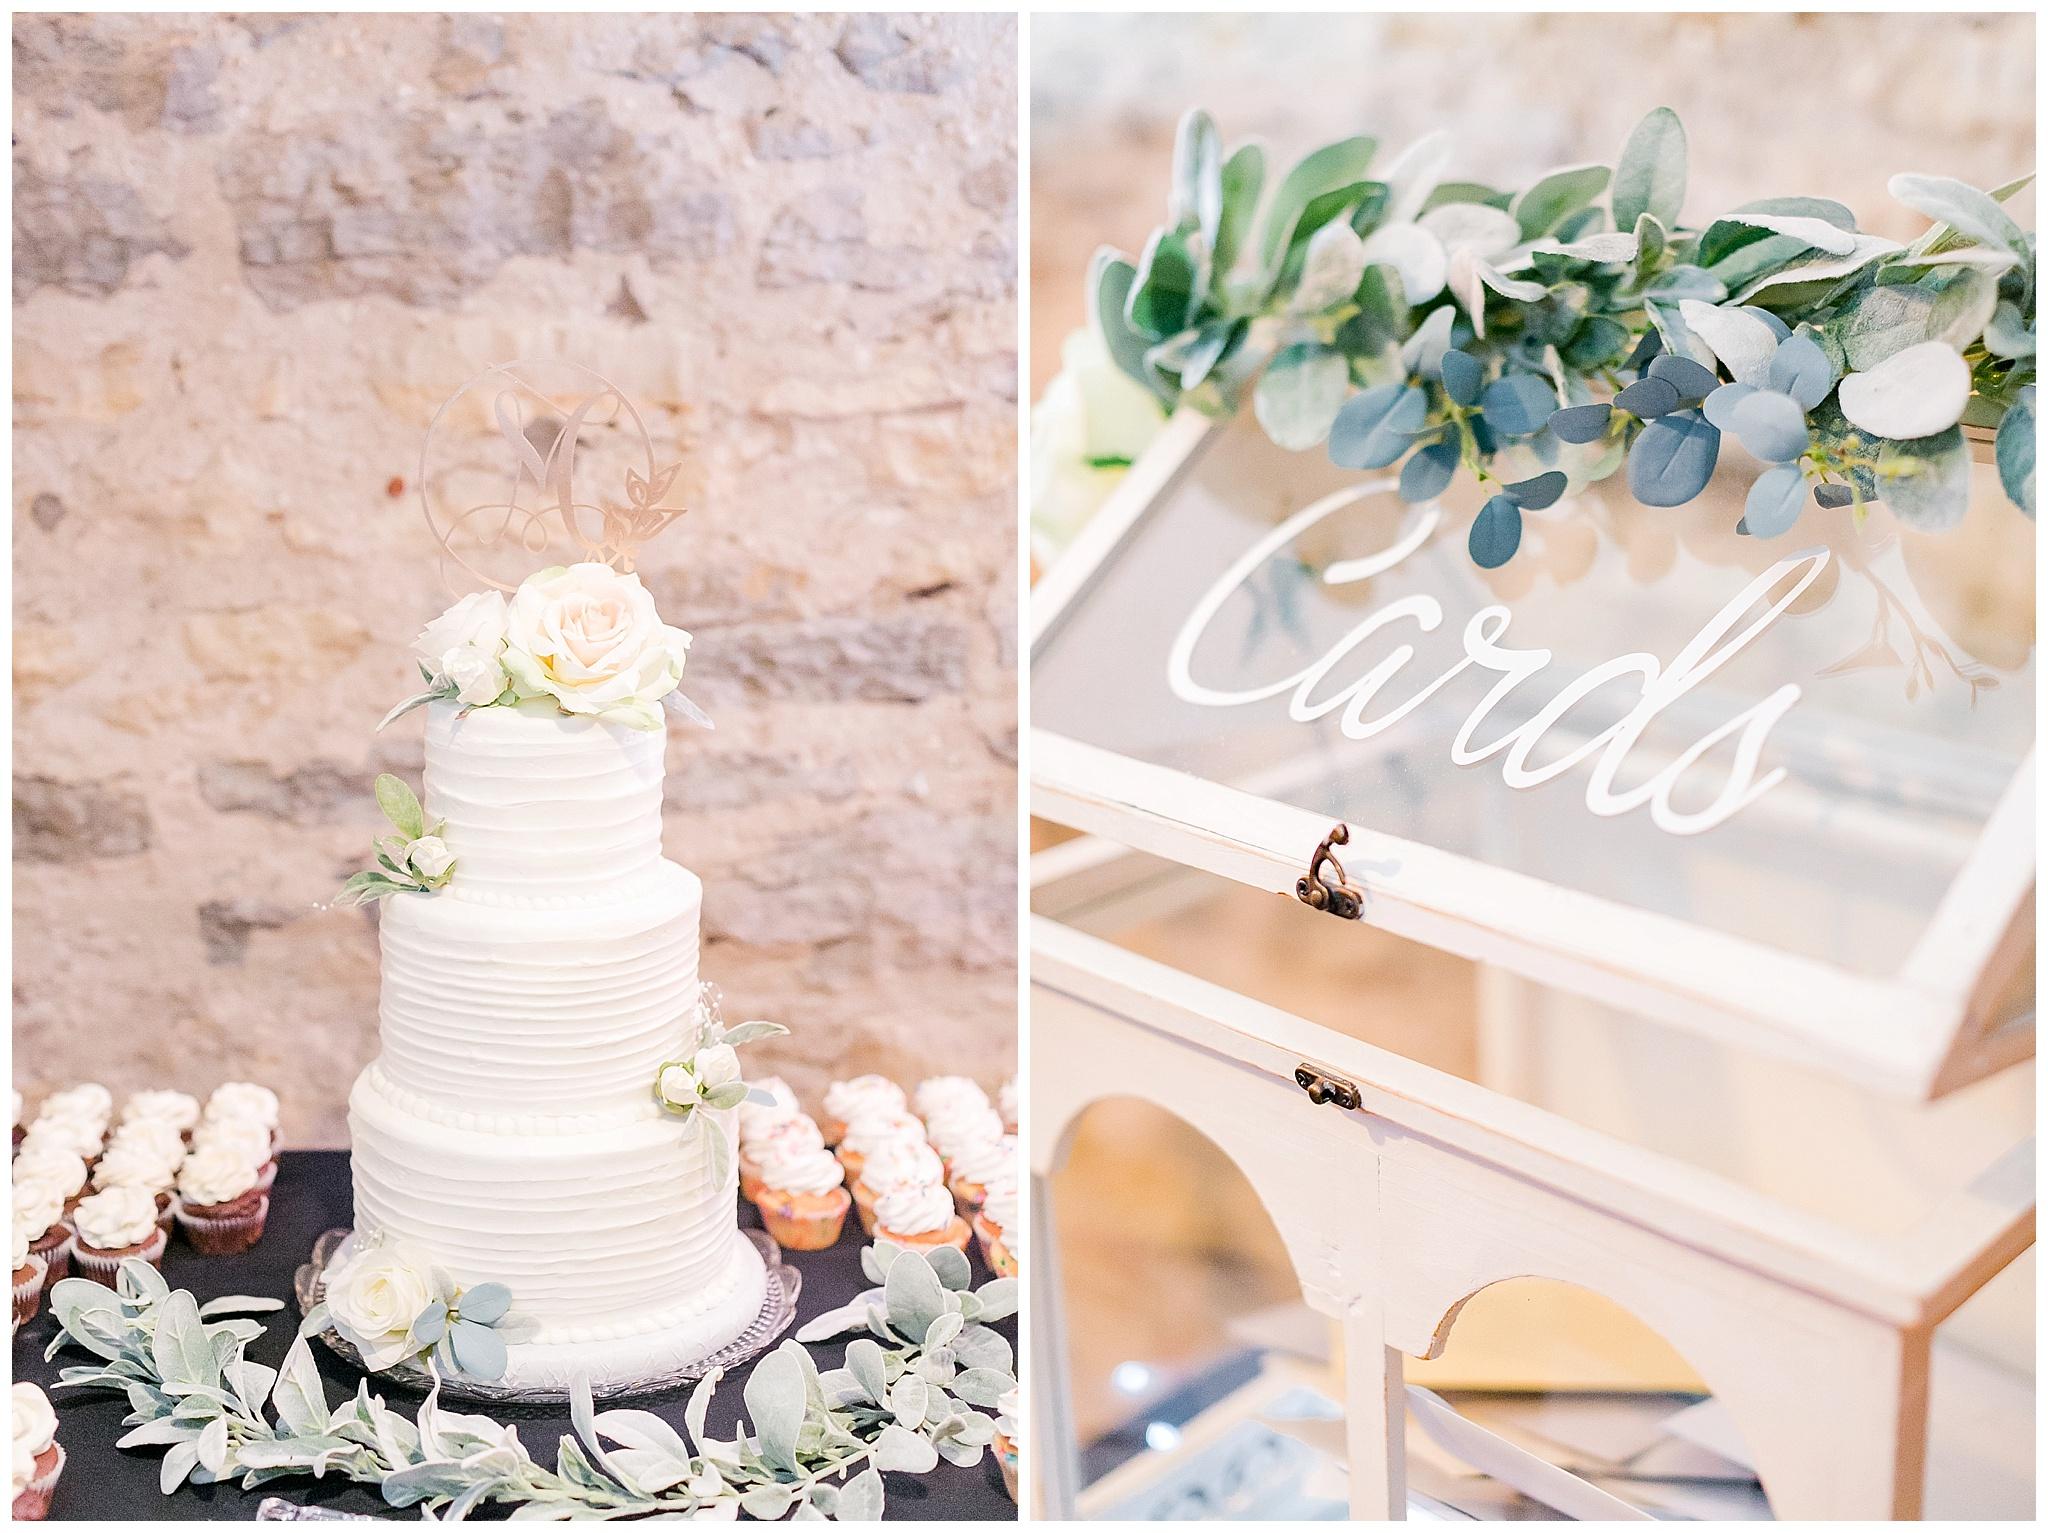 la_casa_grande_wedding_beloit_wisconsin_caynay_photo_0038.jpg